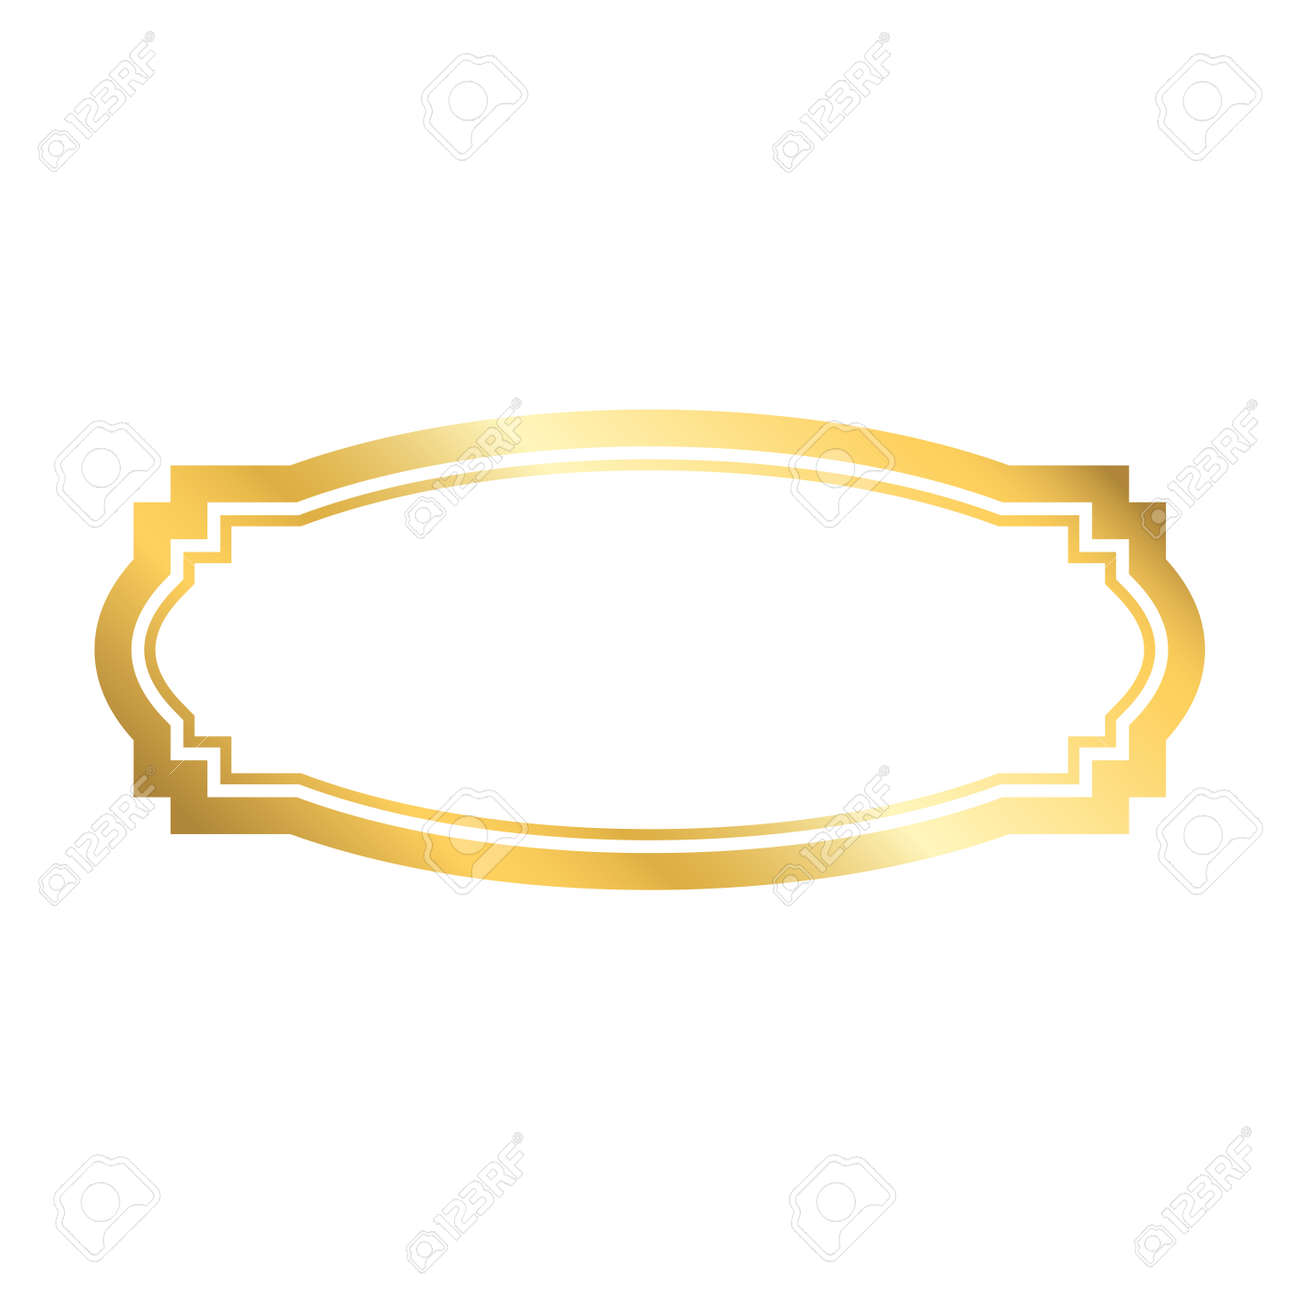 Gold frame  Beautiful simple golden design  Vintage style decorative